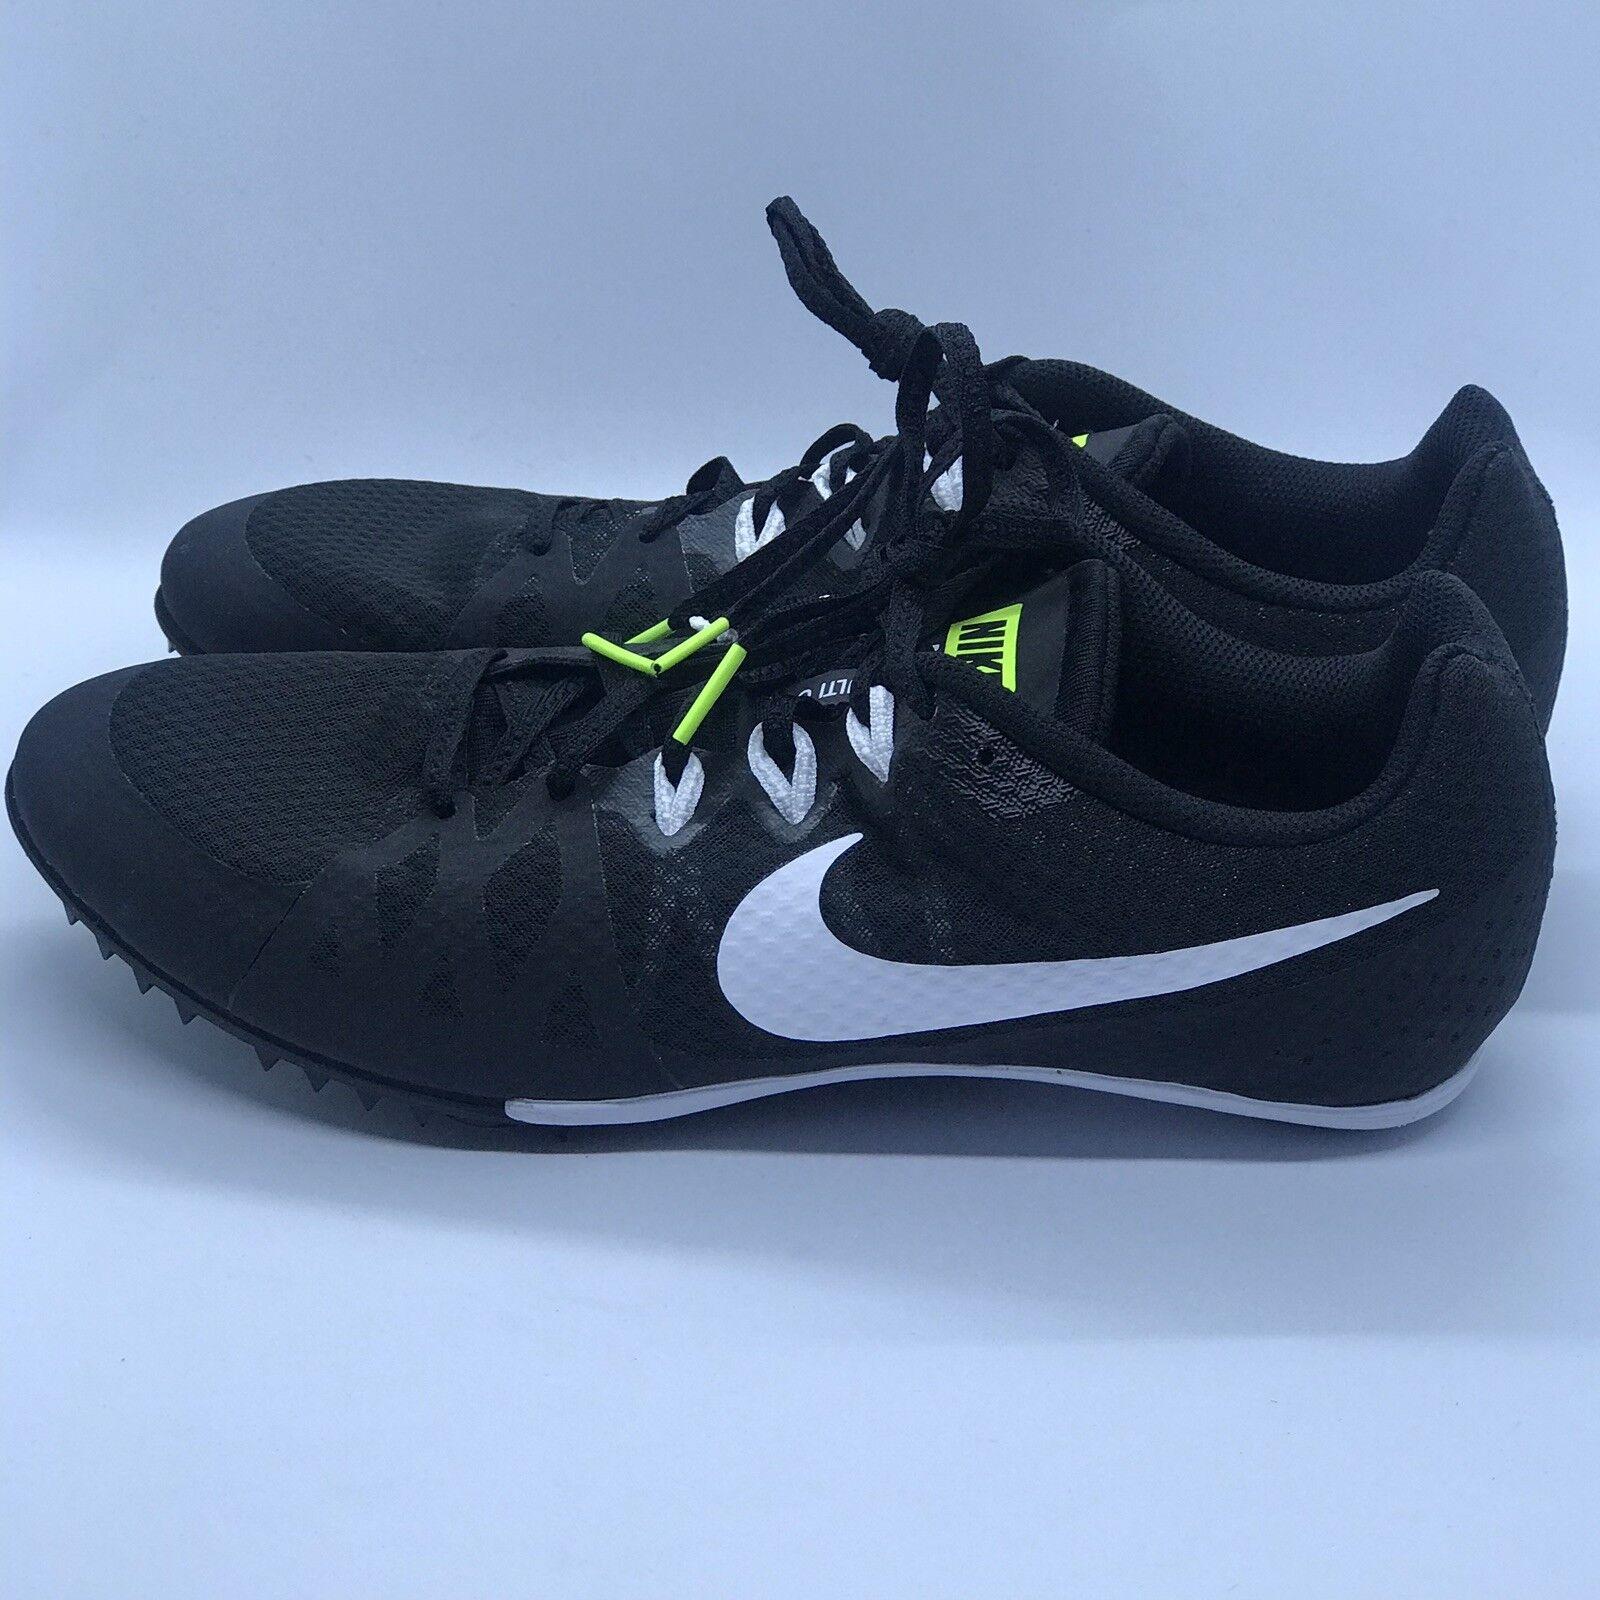 772e8cd1cb430 Nike Zoom Rival M8 Black White 806555-017 Track Field Field Field Spikes  Mens Size